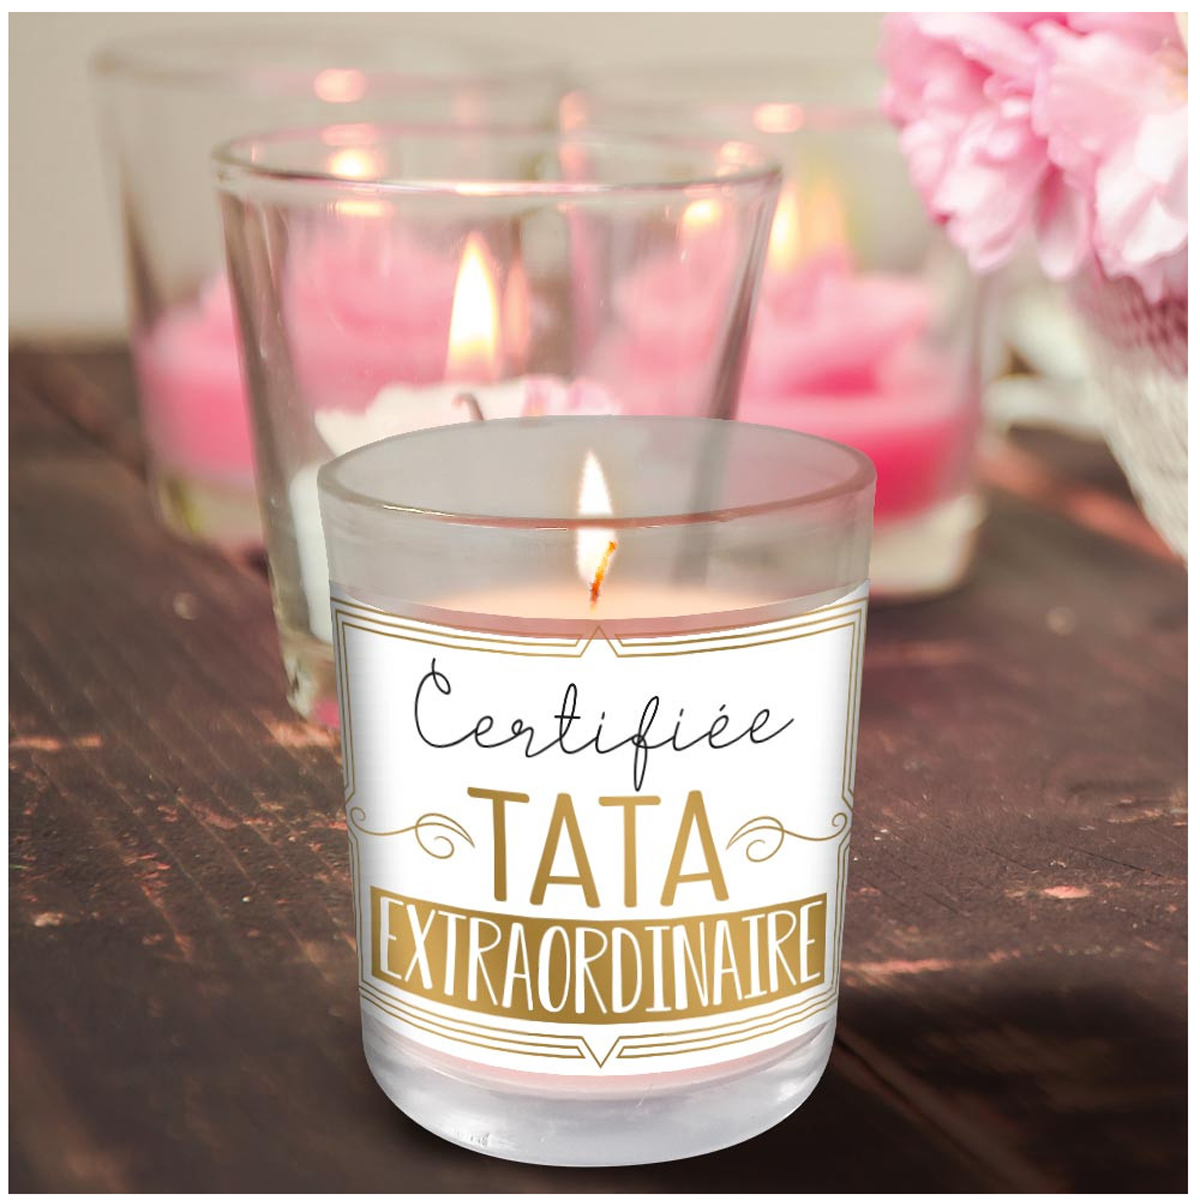 Bougie parfumée \'Certifiée Tata Extraordinaire\' - 92x70 mm (vanille) - [R3994]